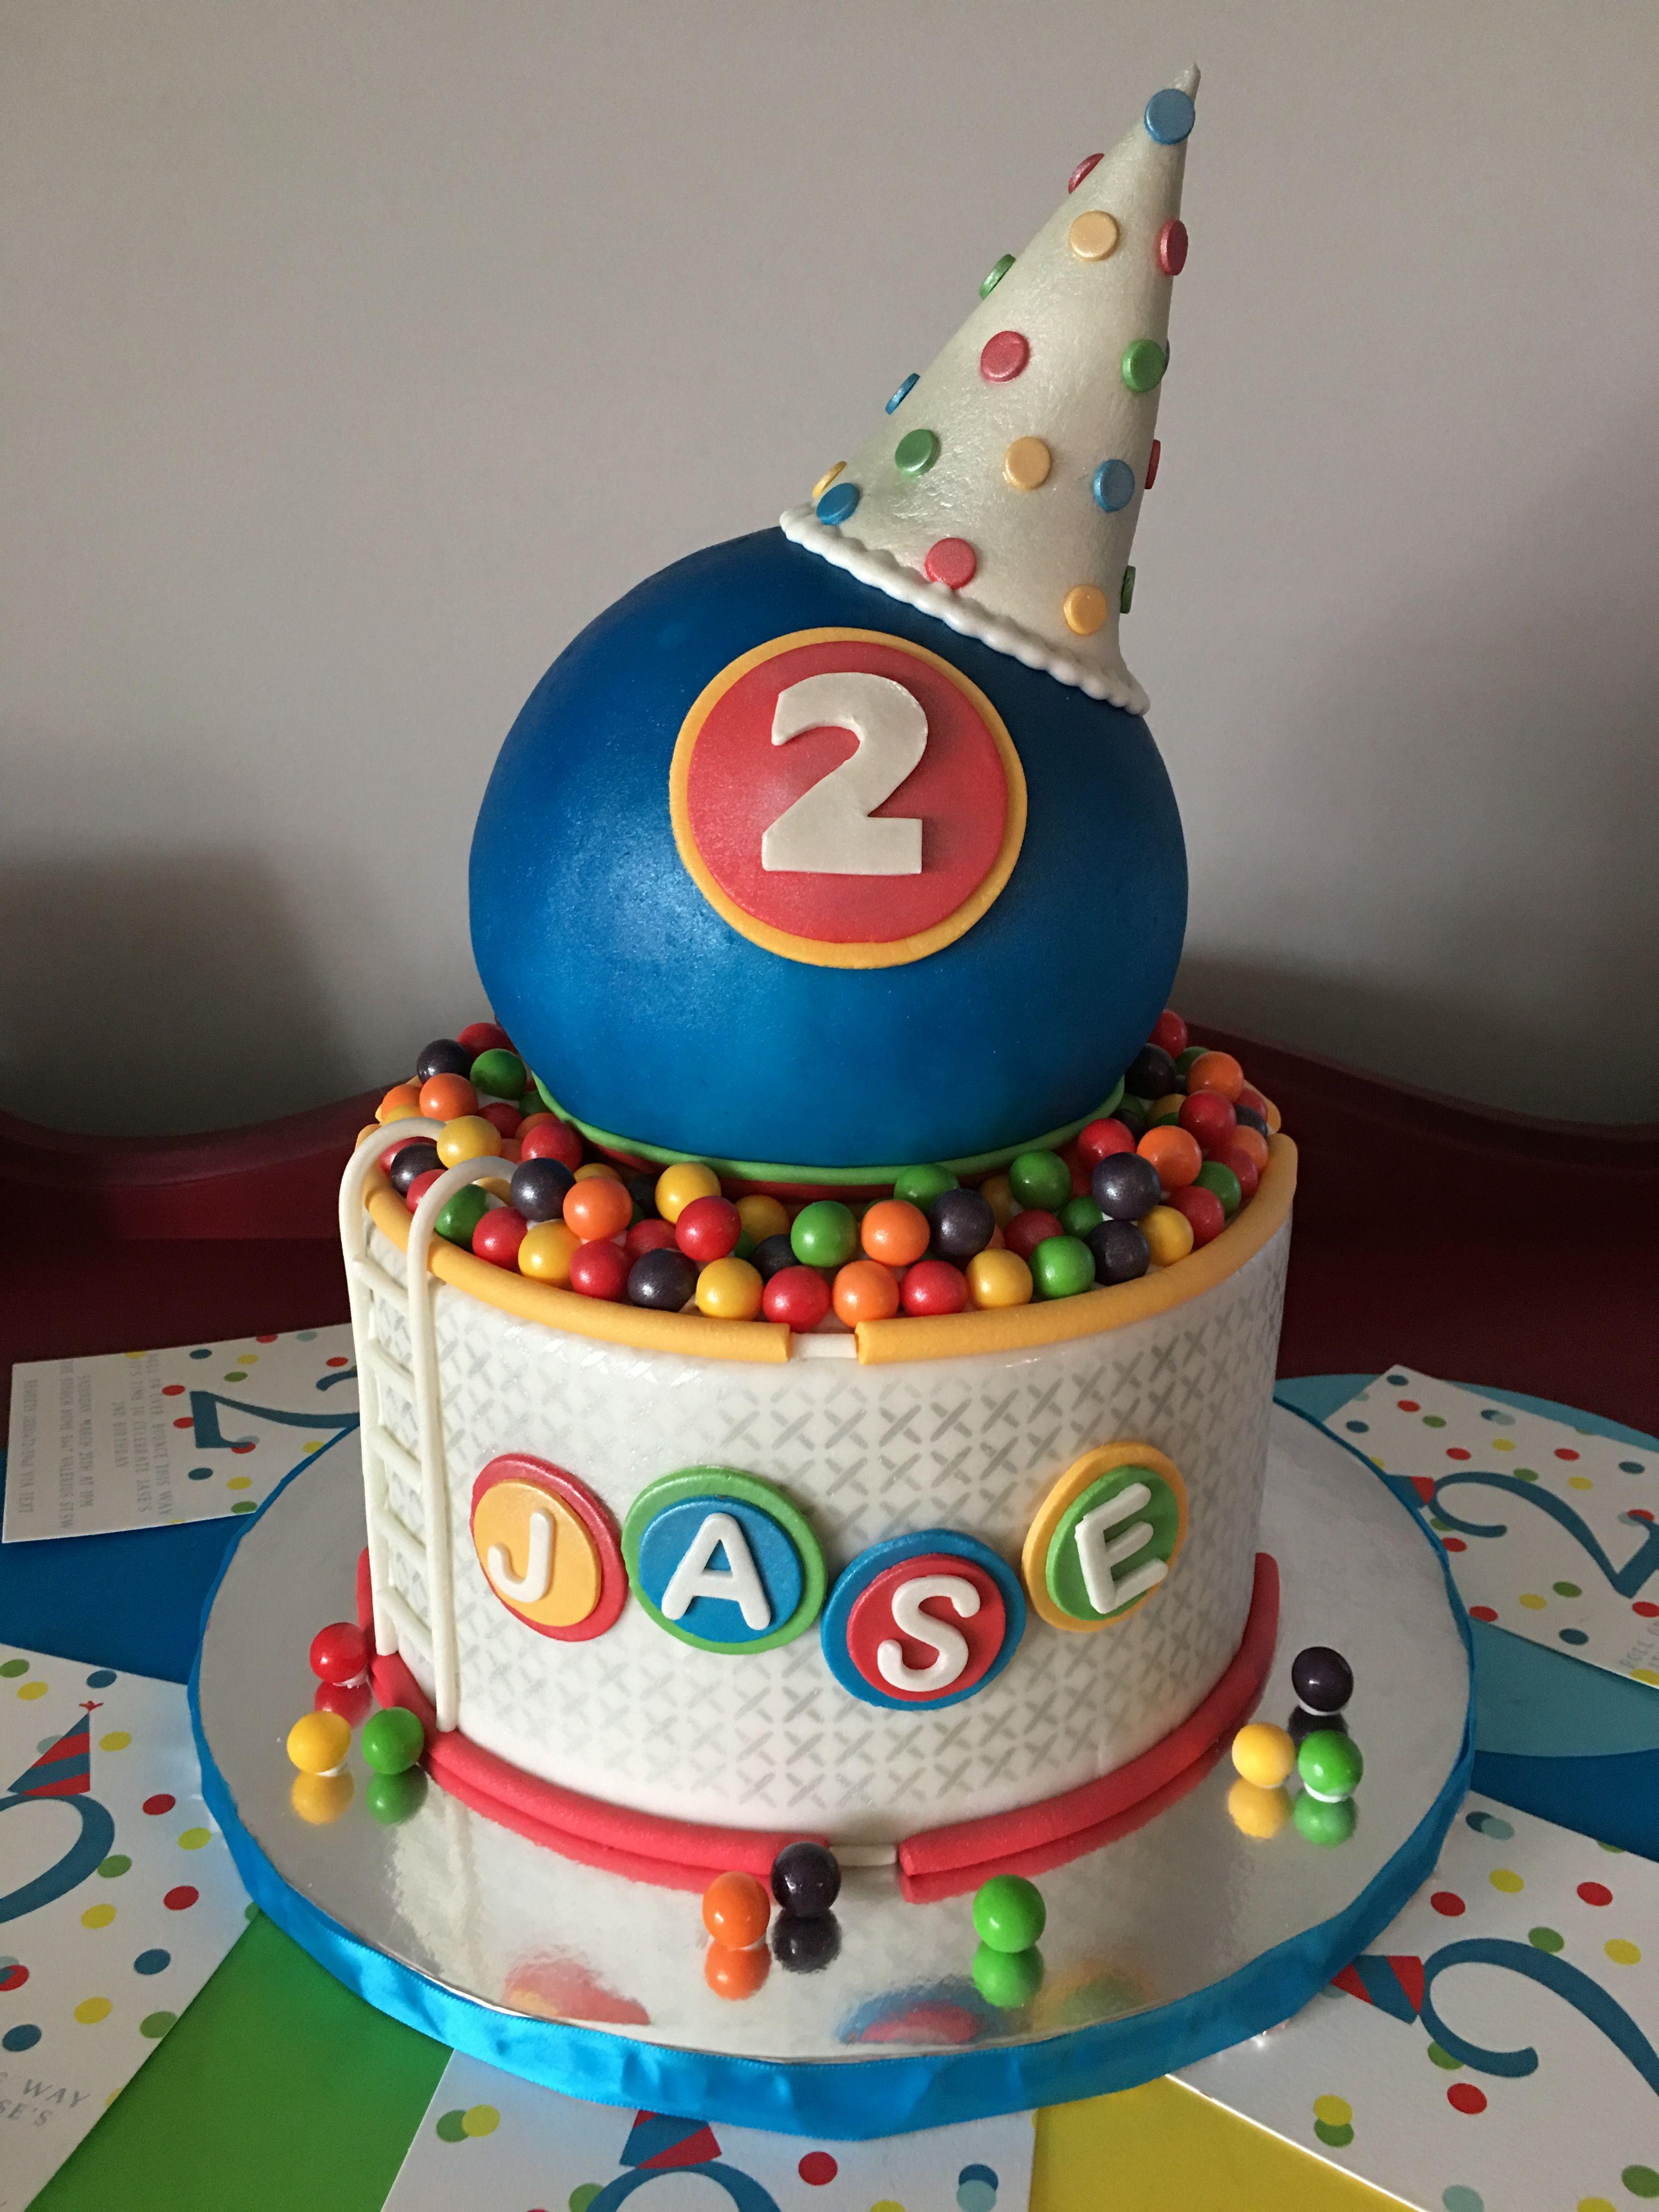 Pleasant Ball Pit Birthday Cake Jases 2Nd Birthday Bouncy Ball Funny Birthday Cards Online Inifodamsfinfo